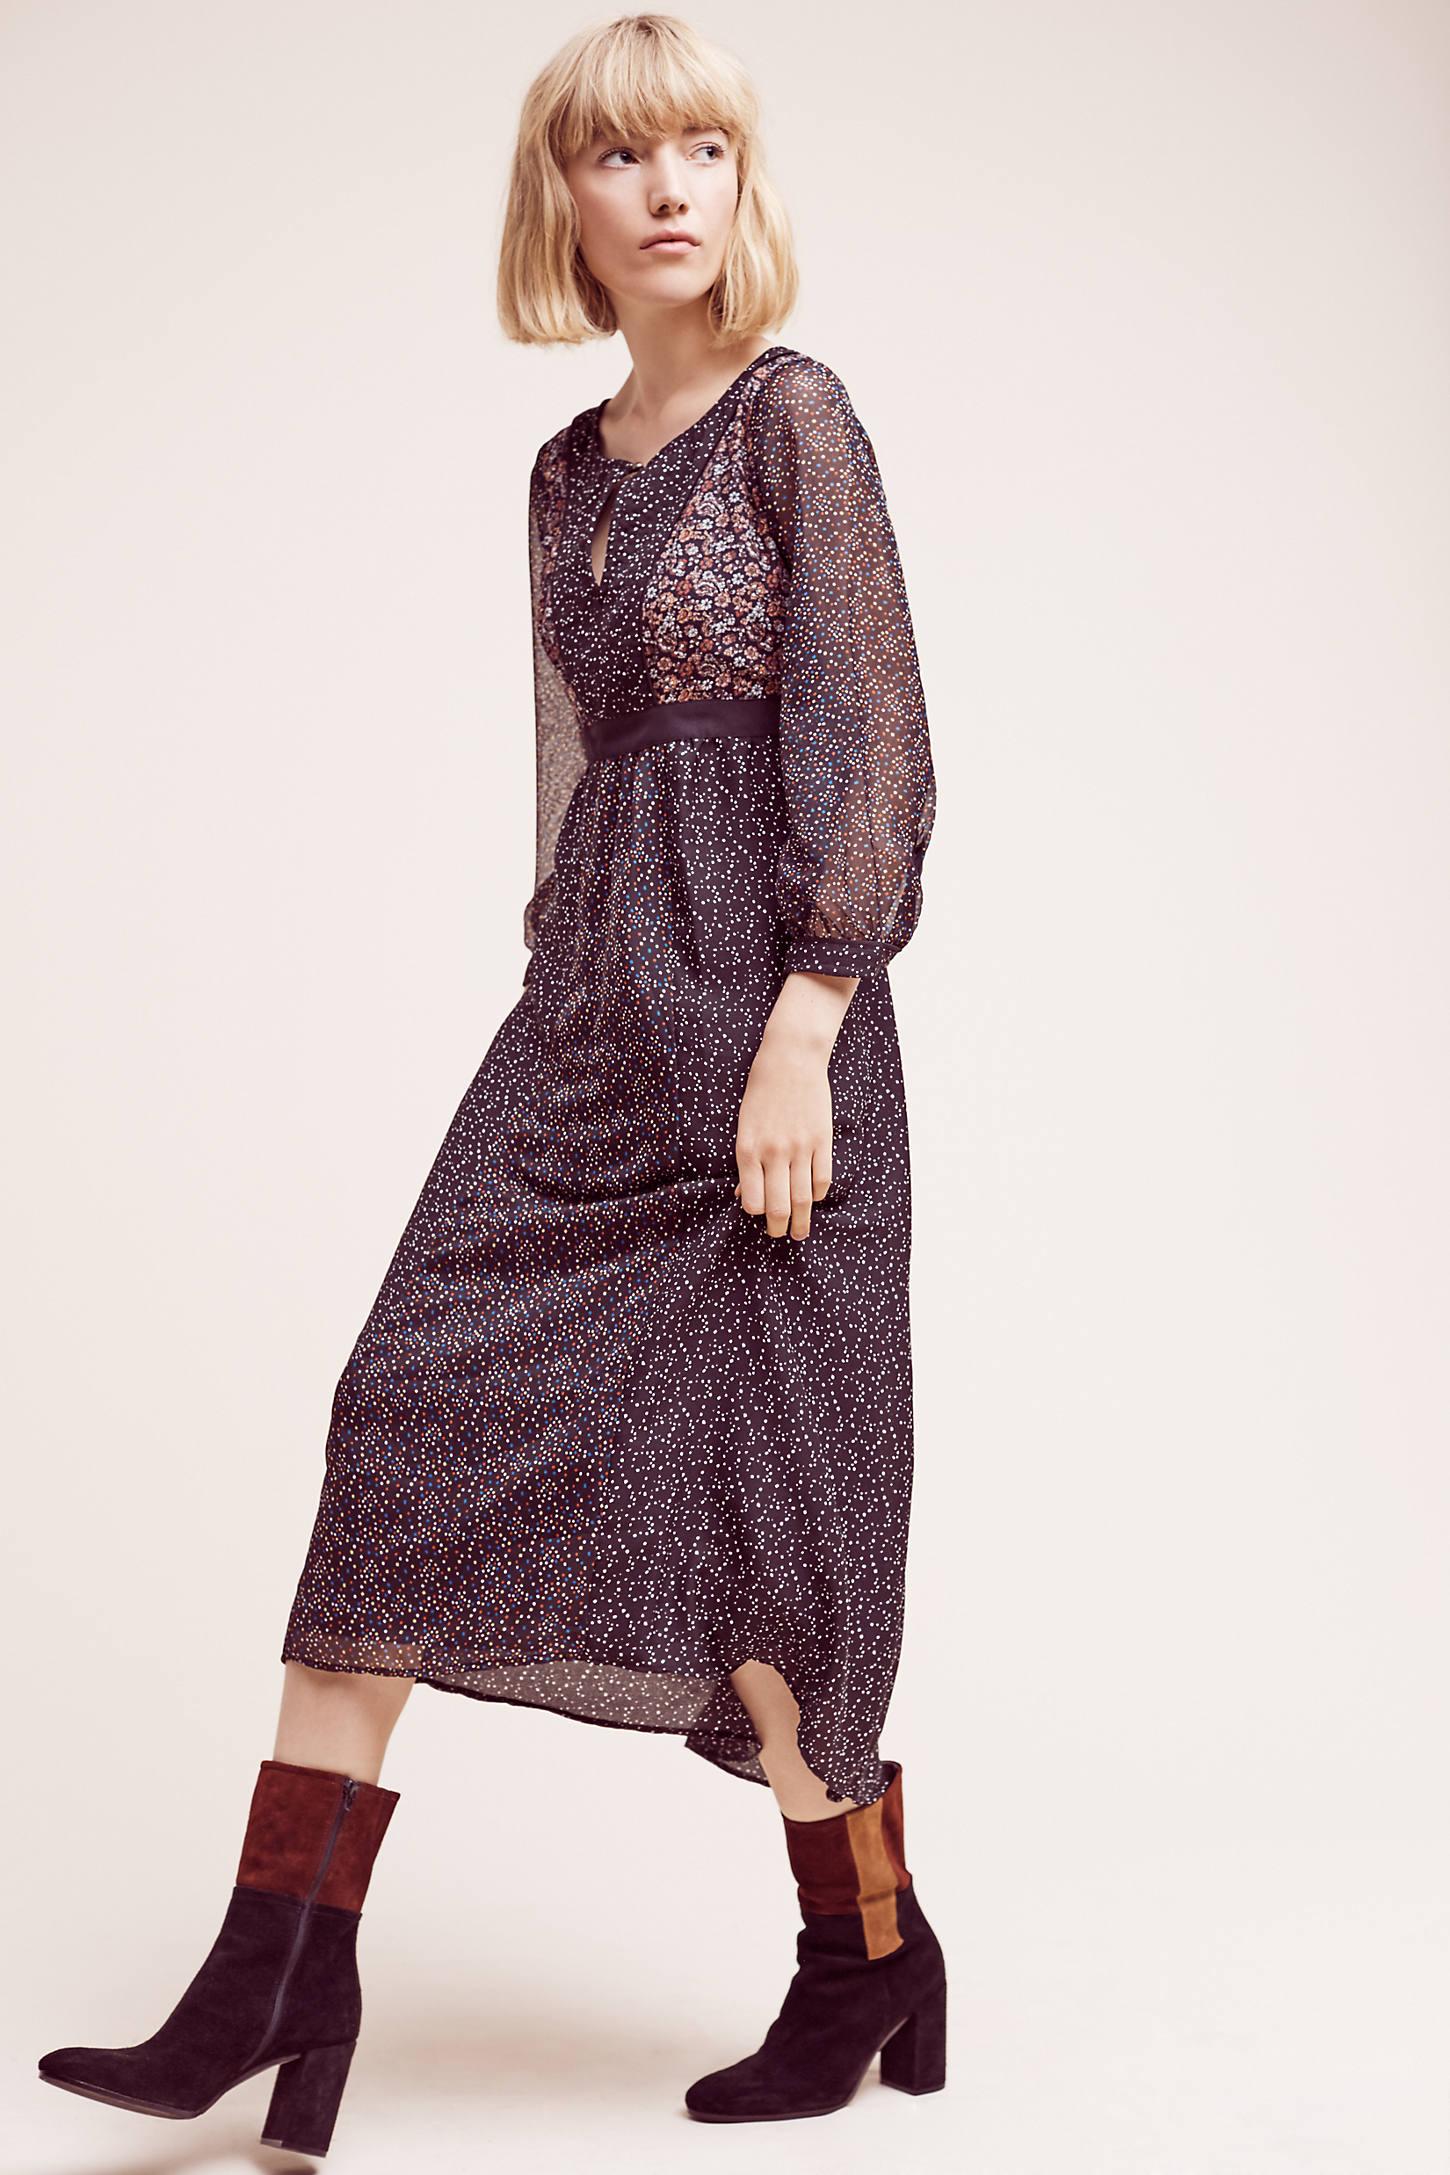 Countryside Maxi Dress, Black